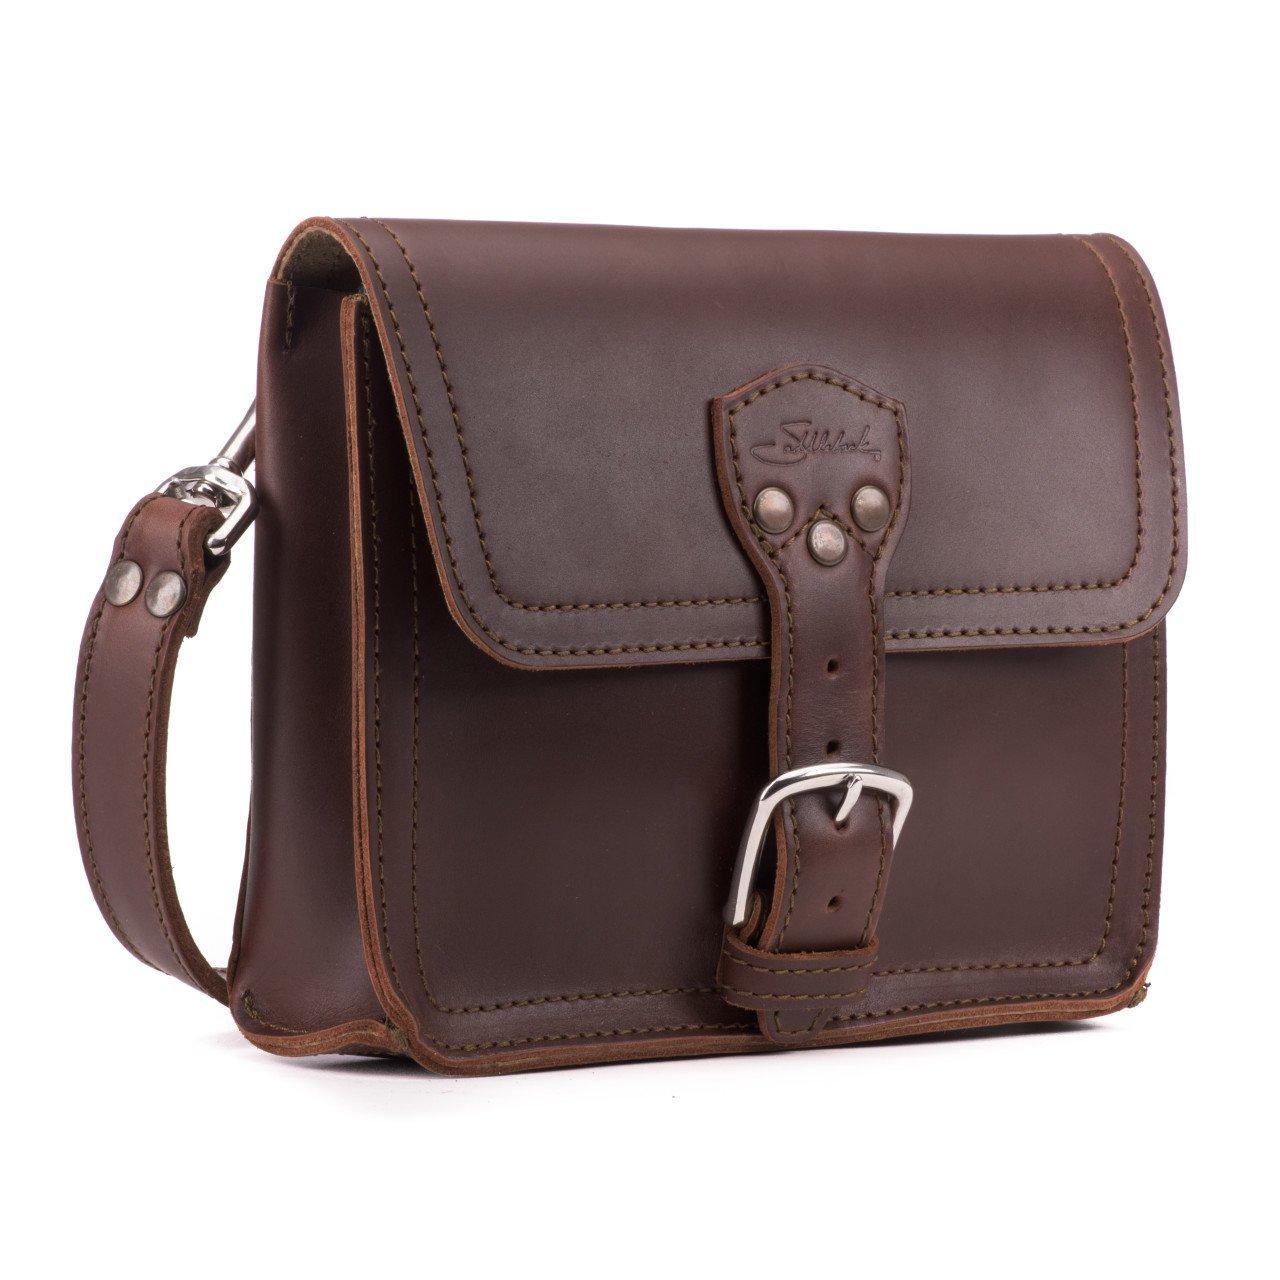 Saddleback Leather Book Bag - 100% Full Grain Leather Satchel Bag with 100 Year Warranty